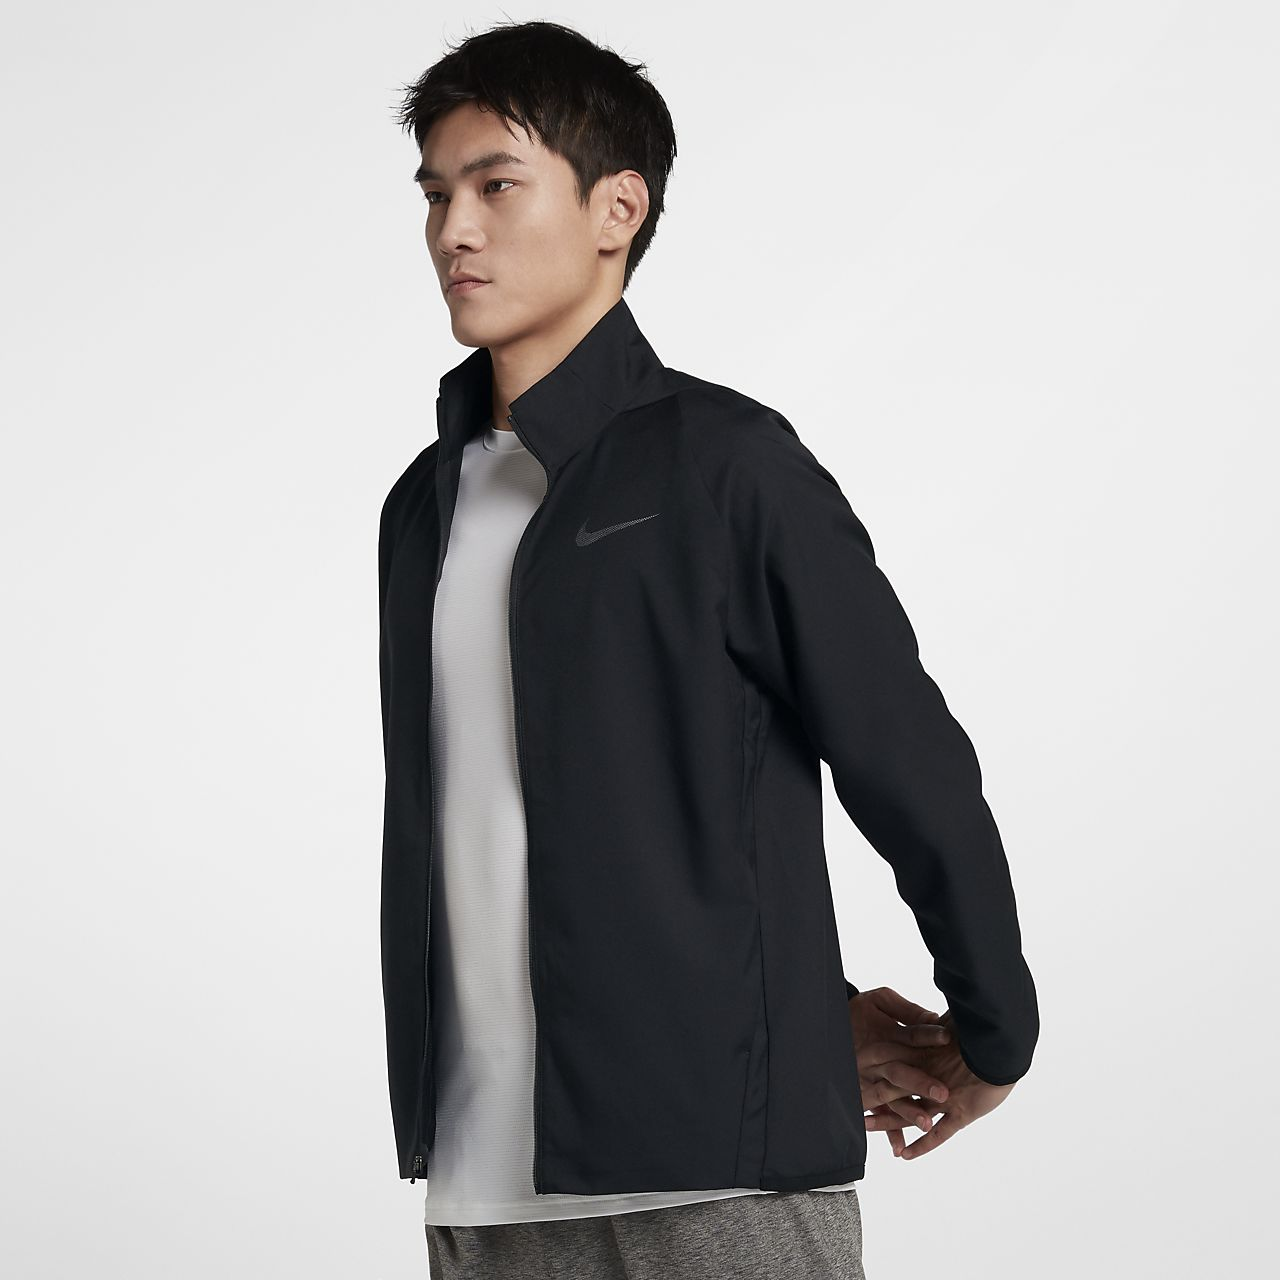 Nike Dri-FIT Web-Trainingsjacke für Herren